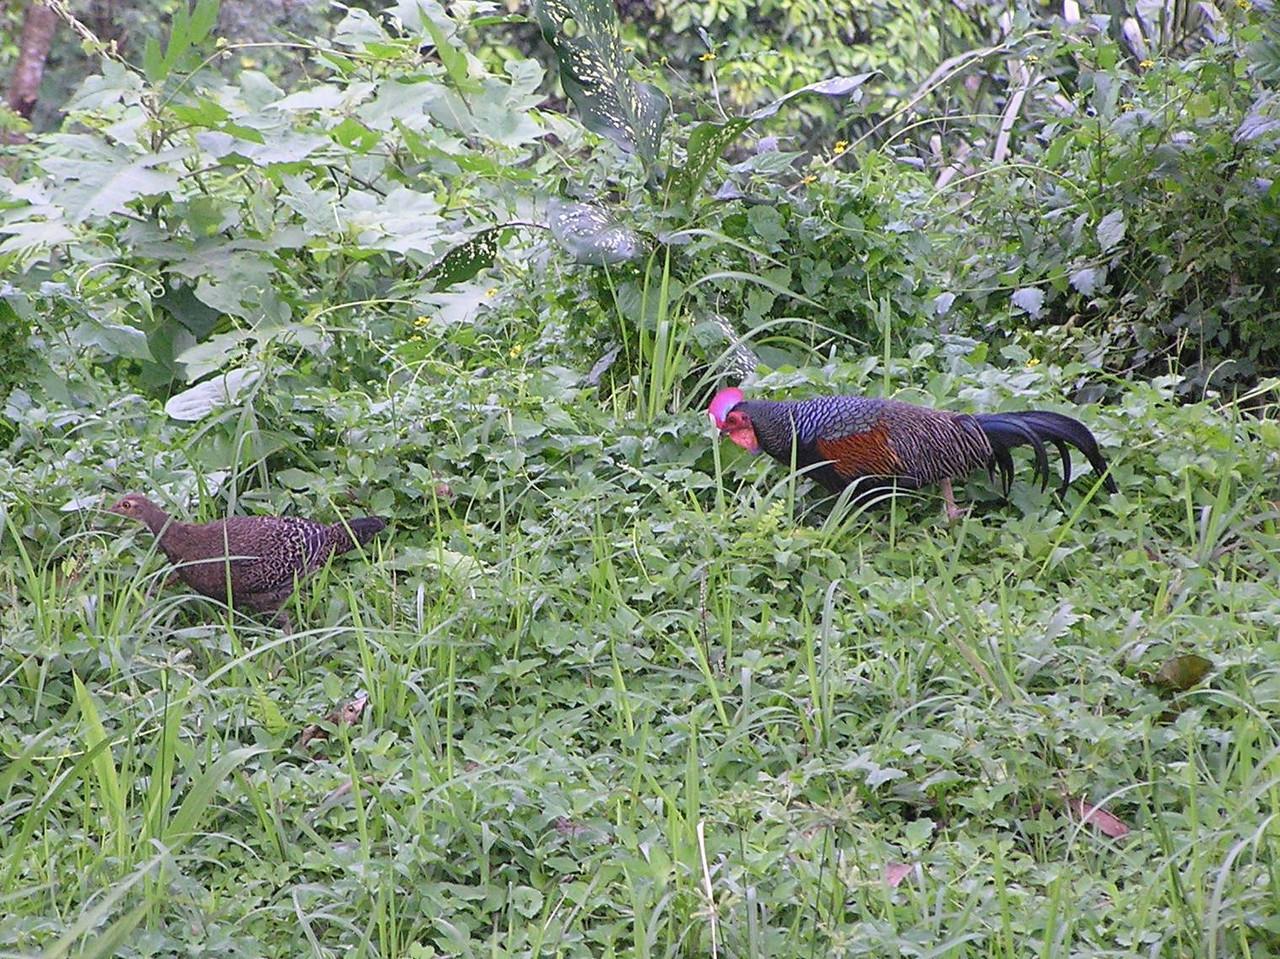 pheasant bali aug 2010